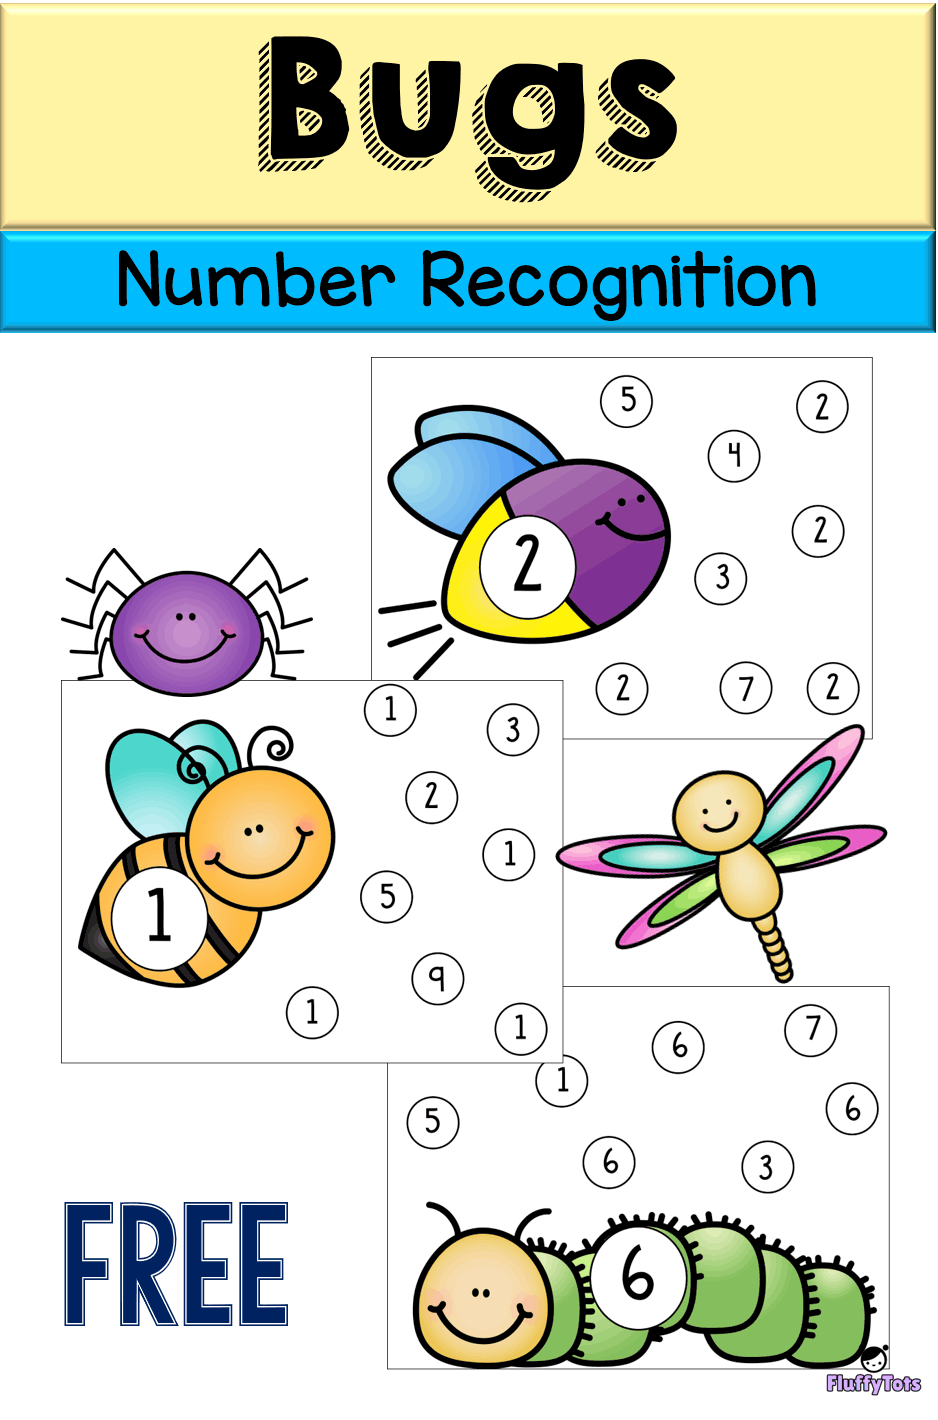 Free Bugs Number Recognition For Preschool Prek And Kindergarten Perfect For Stud Math Activities Preschool Numbers Preschool Preschool Insects Activities [ 1420 x 938 Pixel ]